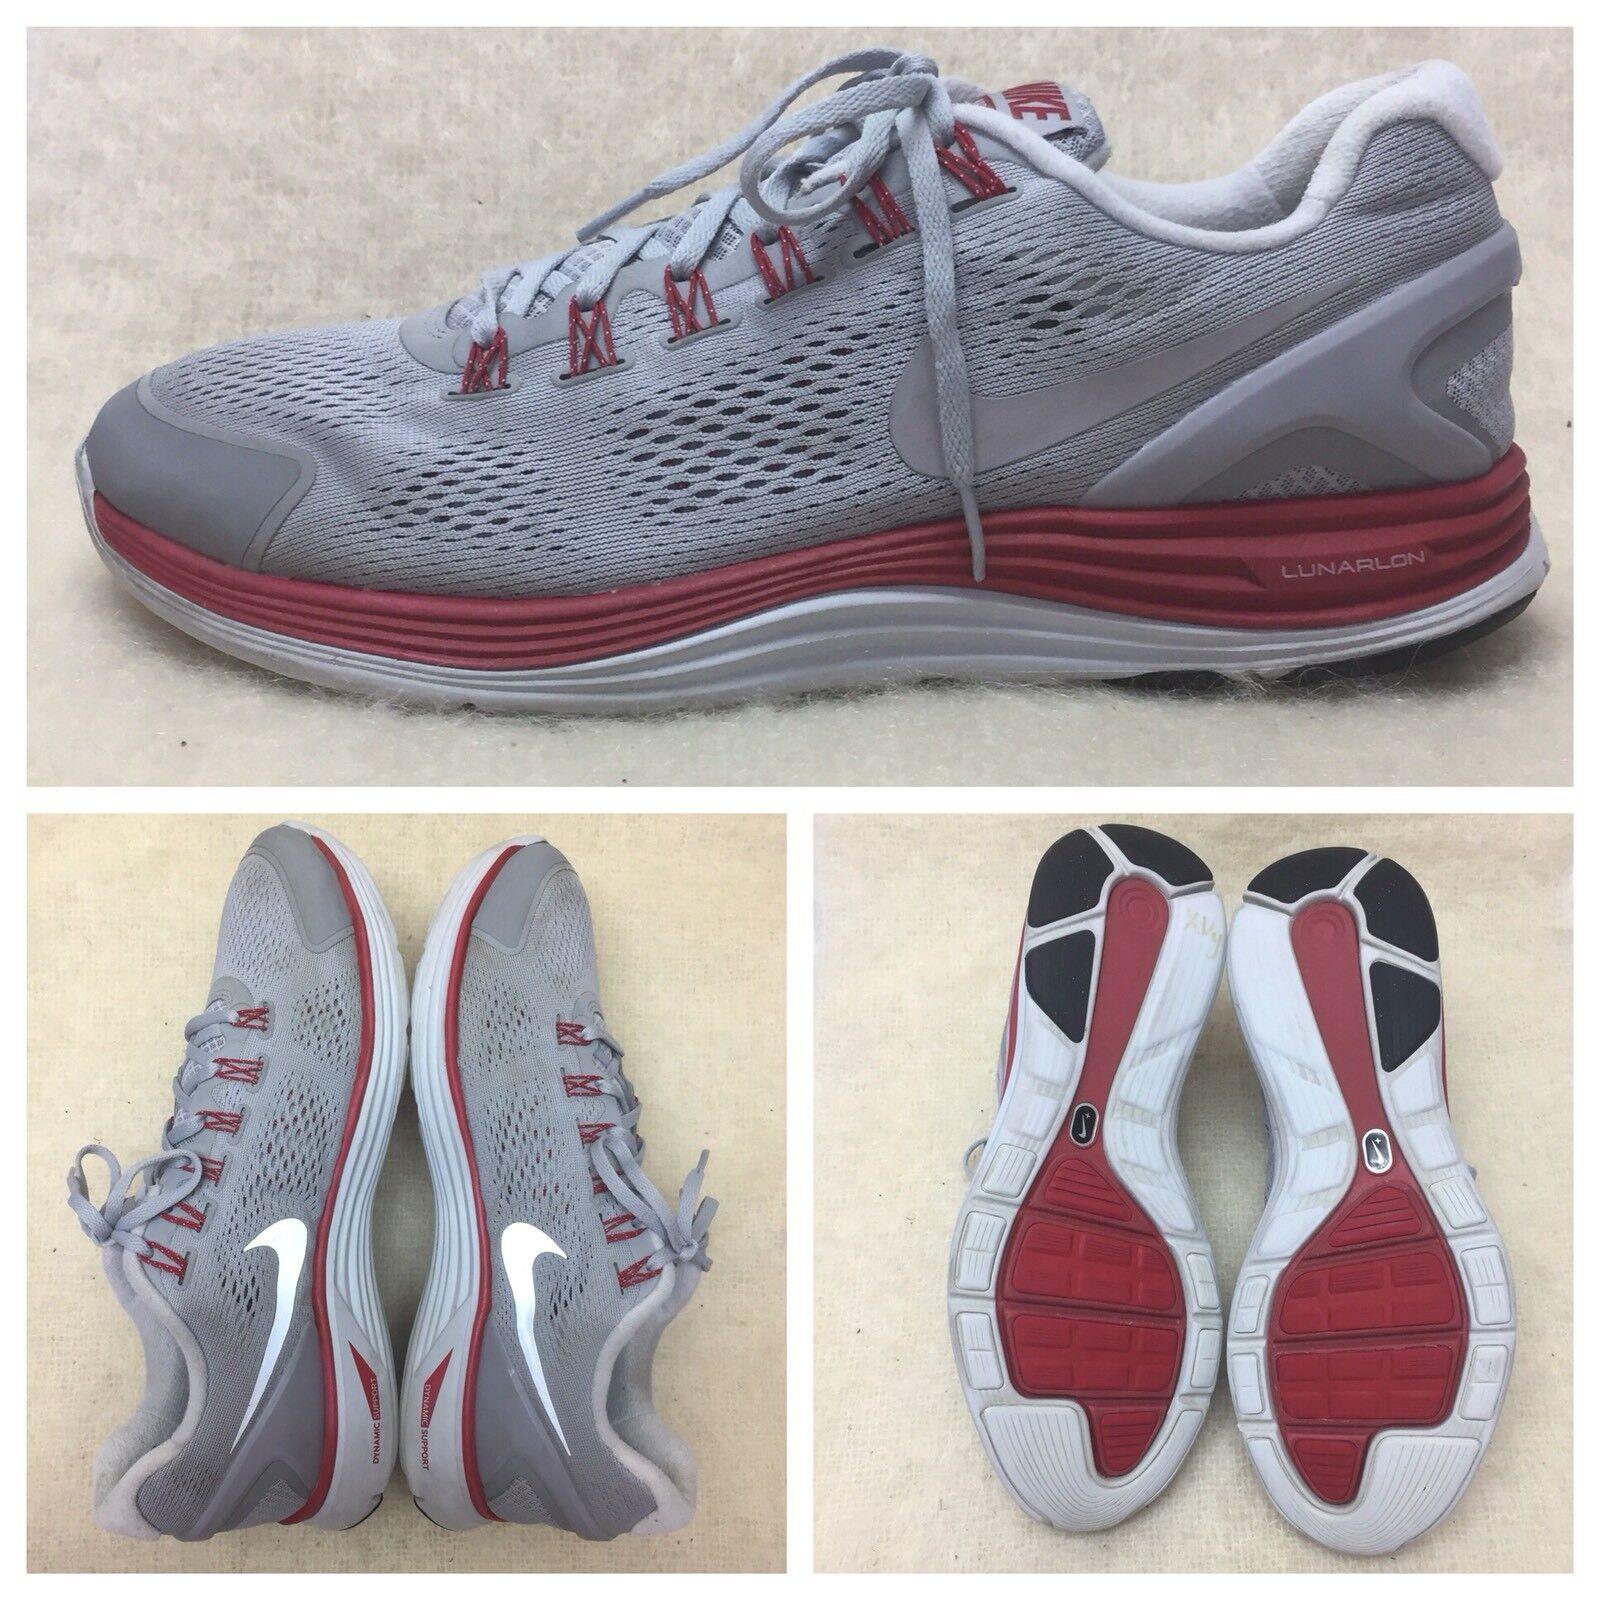 Nike lunarglide   4 uomini 524977-005 atletico scarpa da corsa, noi 14 noi gray